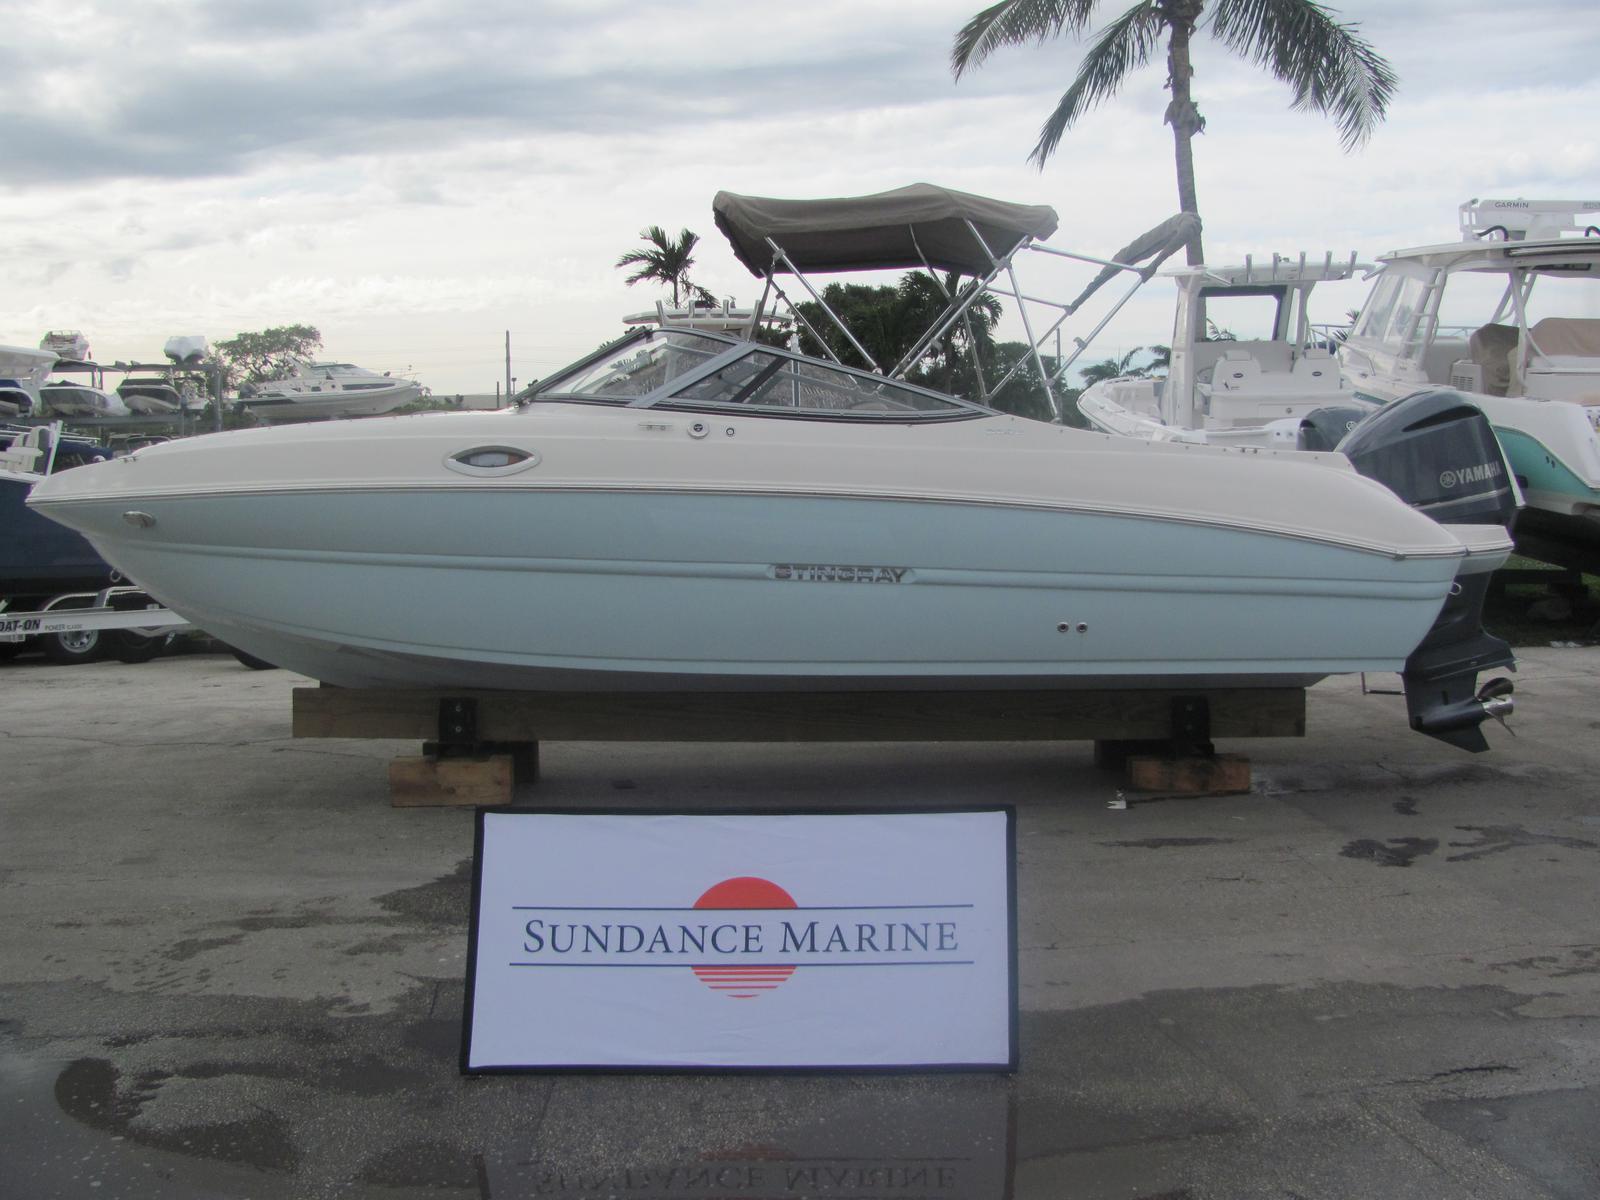 Stingray 234LR